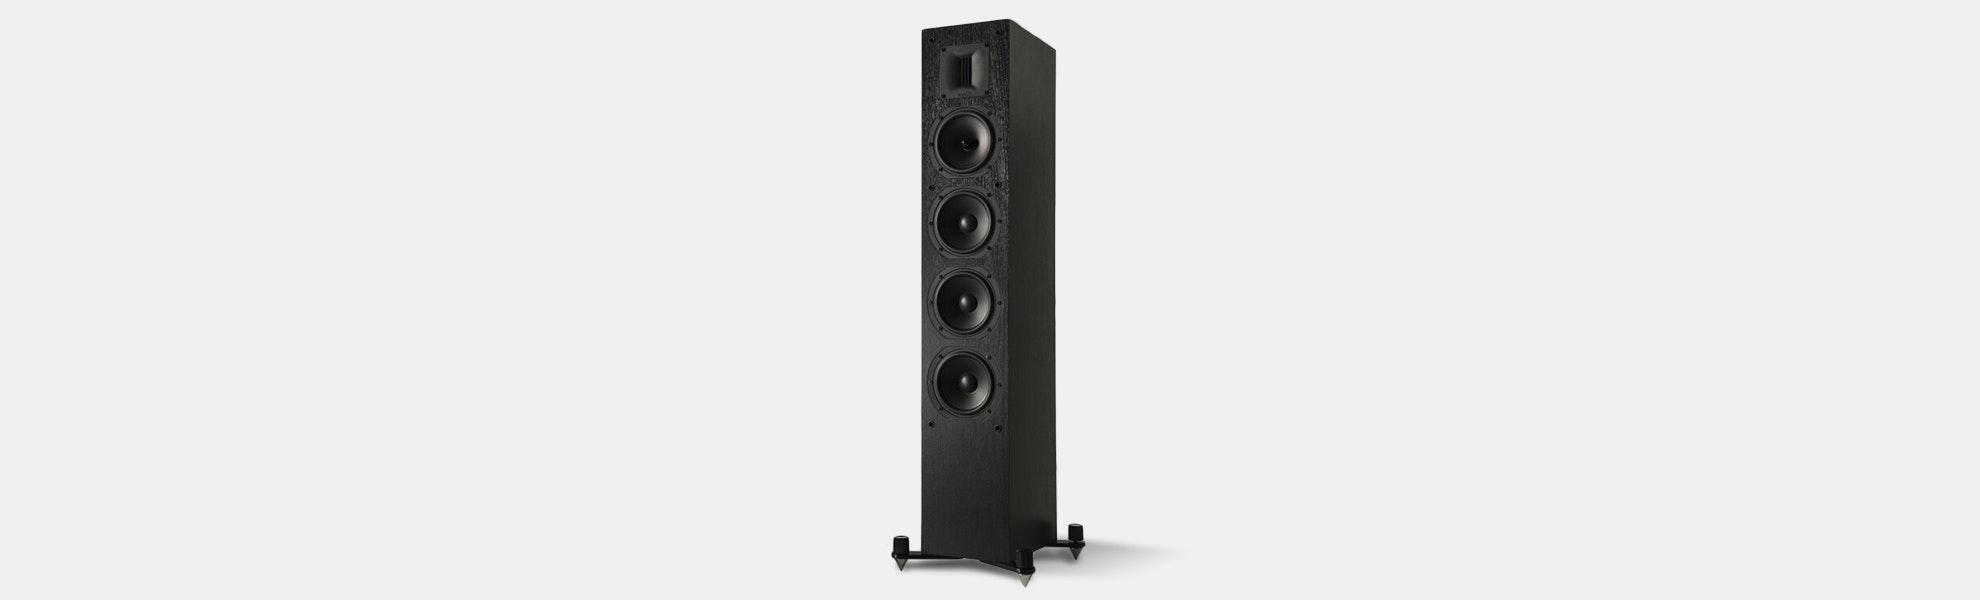 Chane A5.4 Speaker